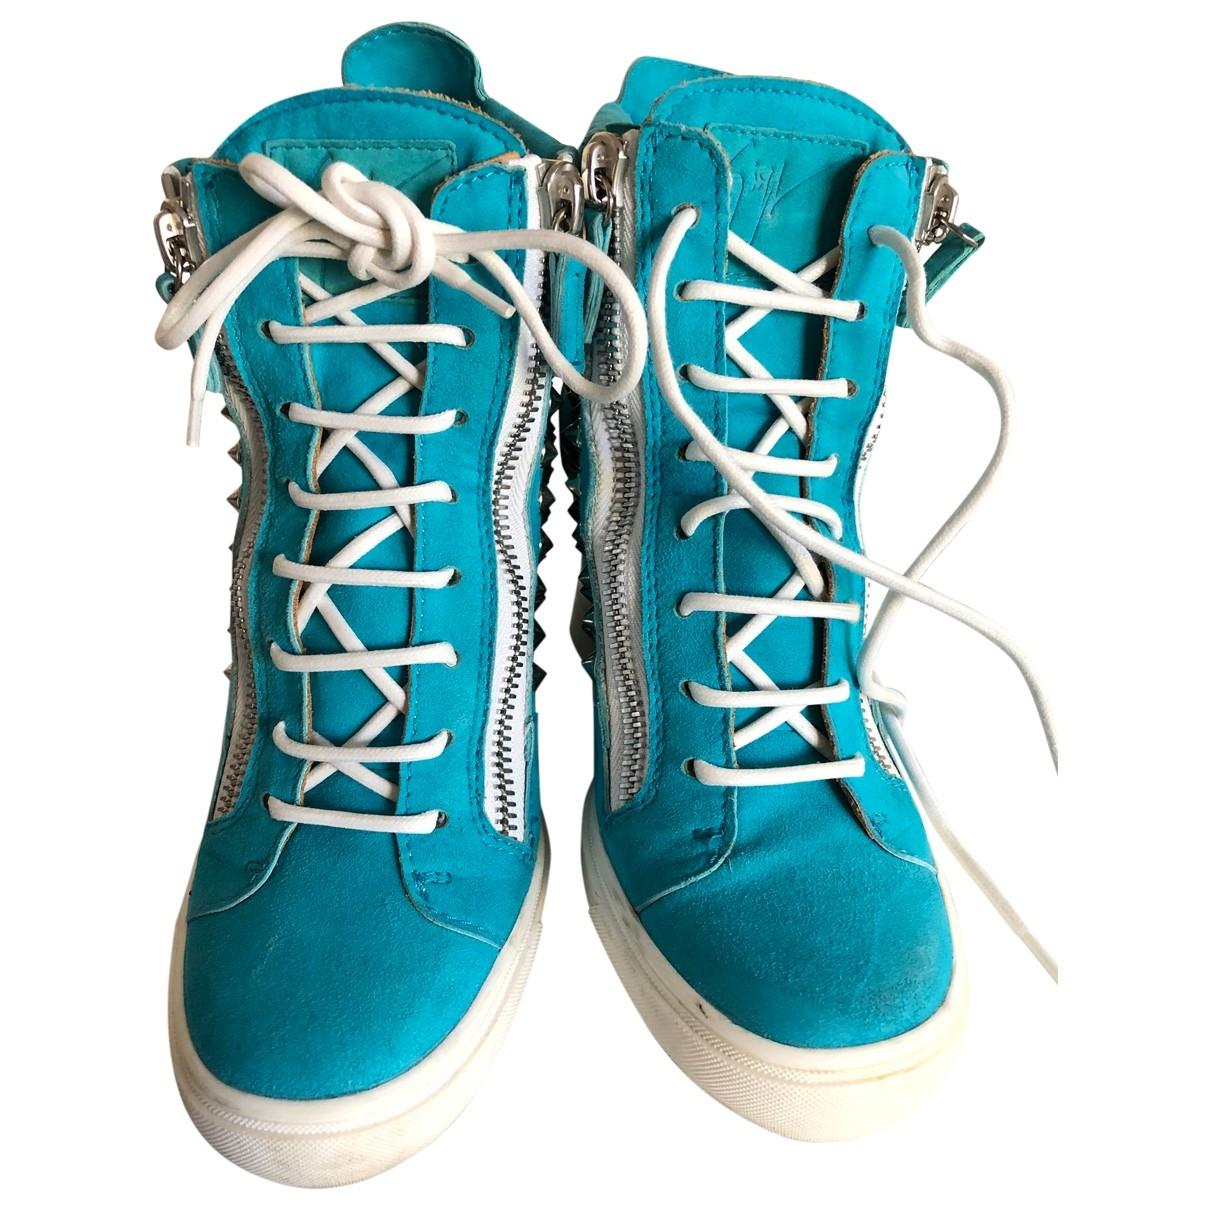 Giuseppe Zanotti - Baskets   pour femme en suede - marine